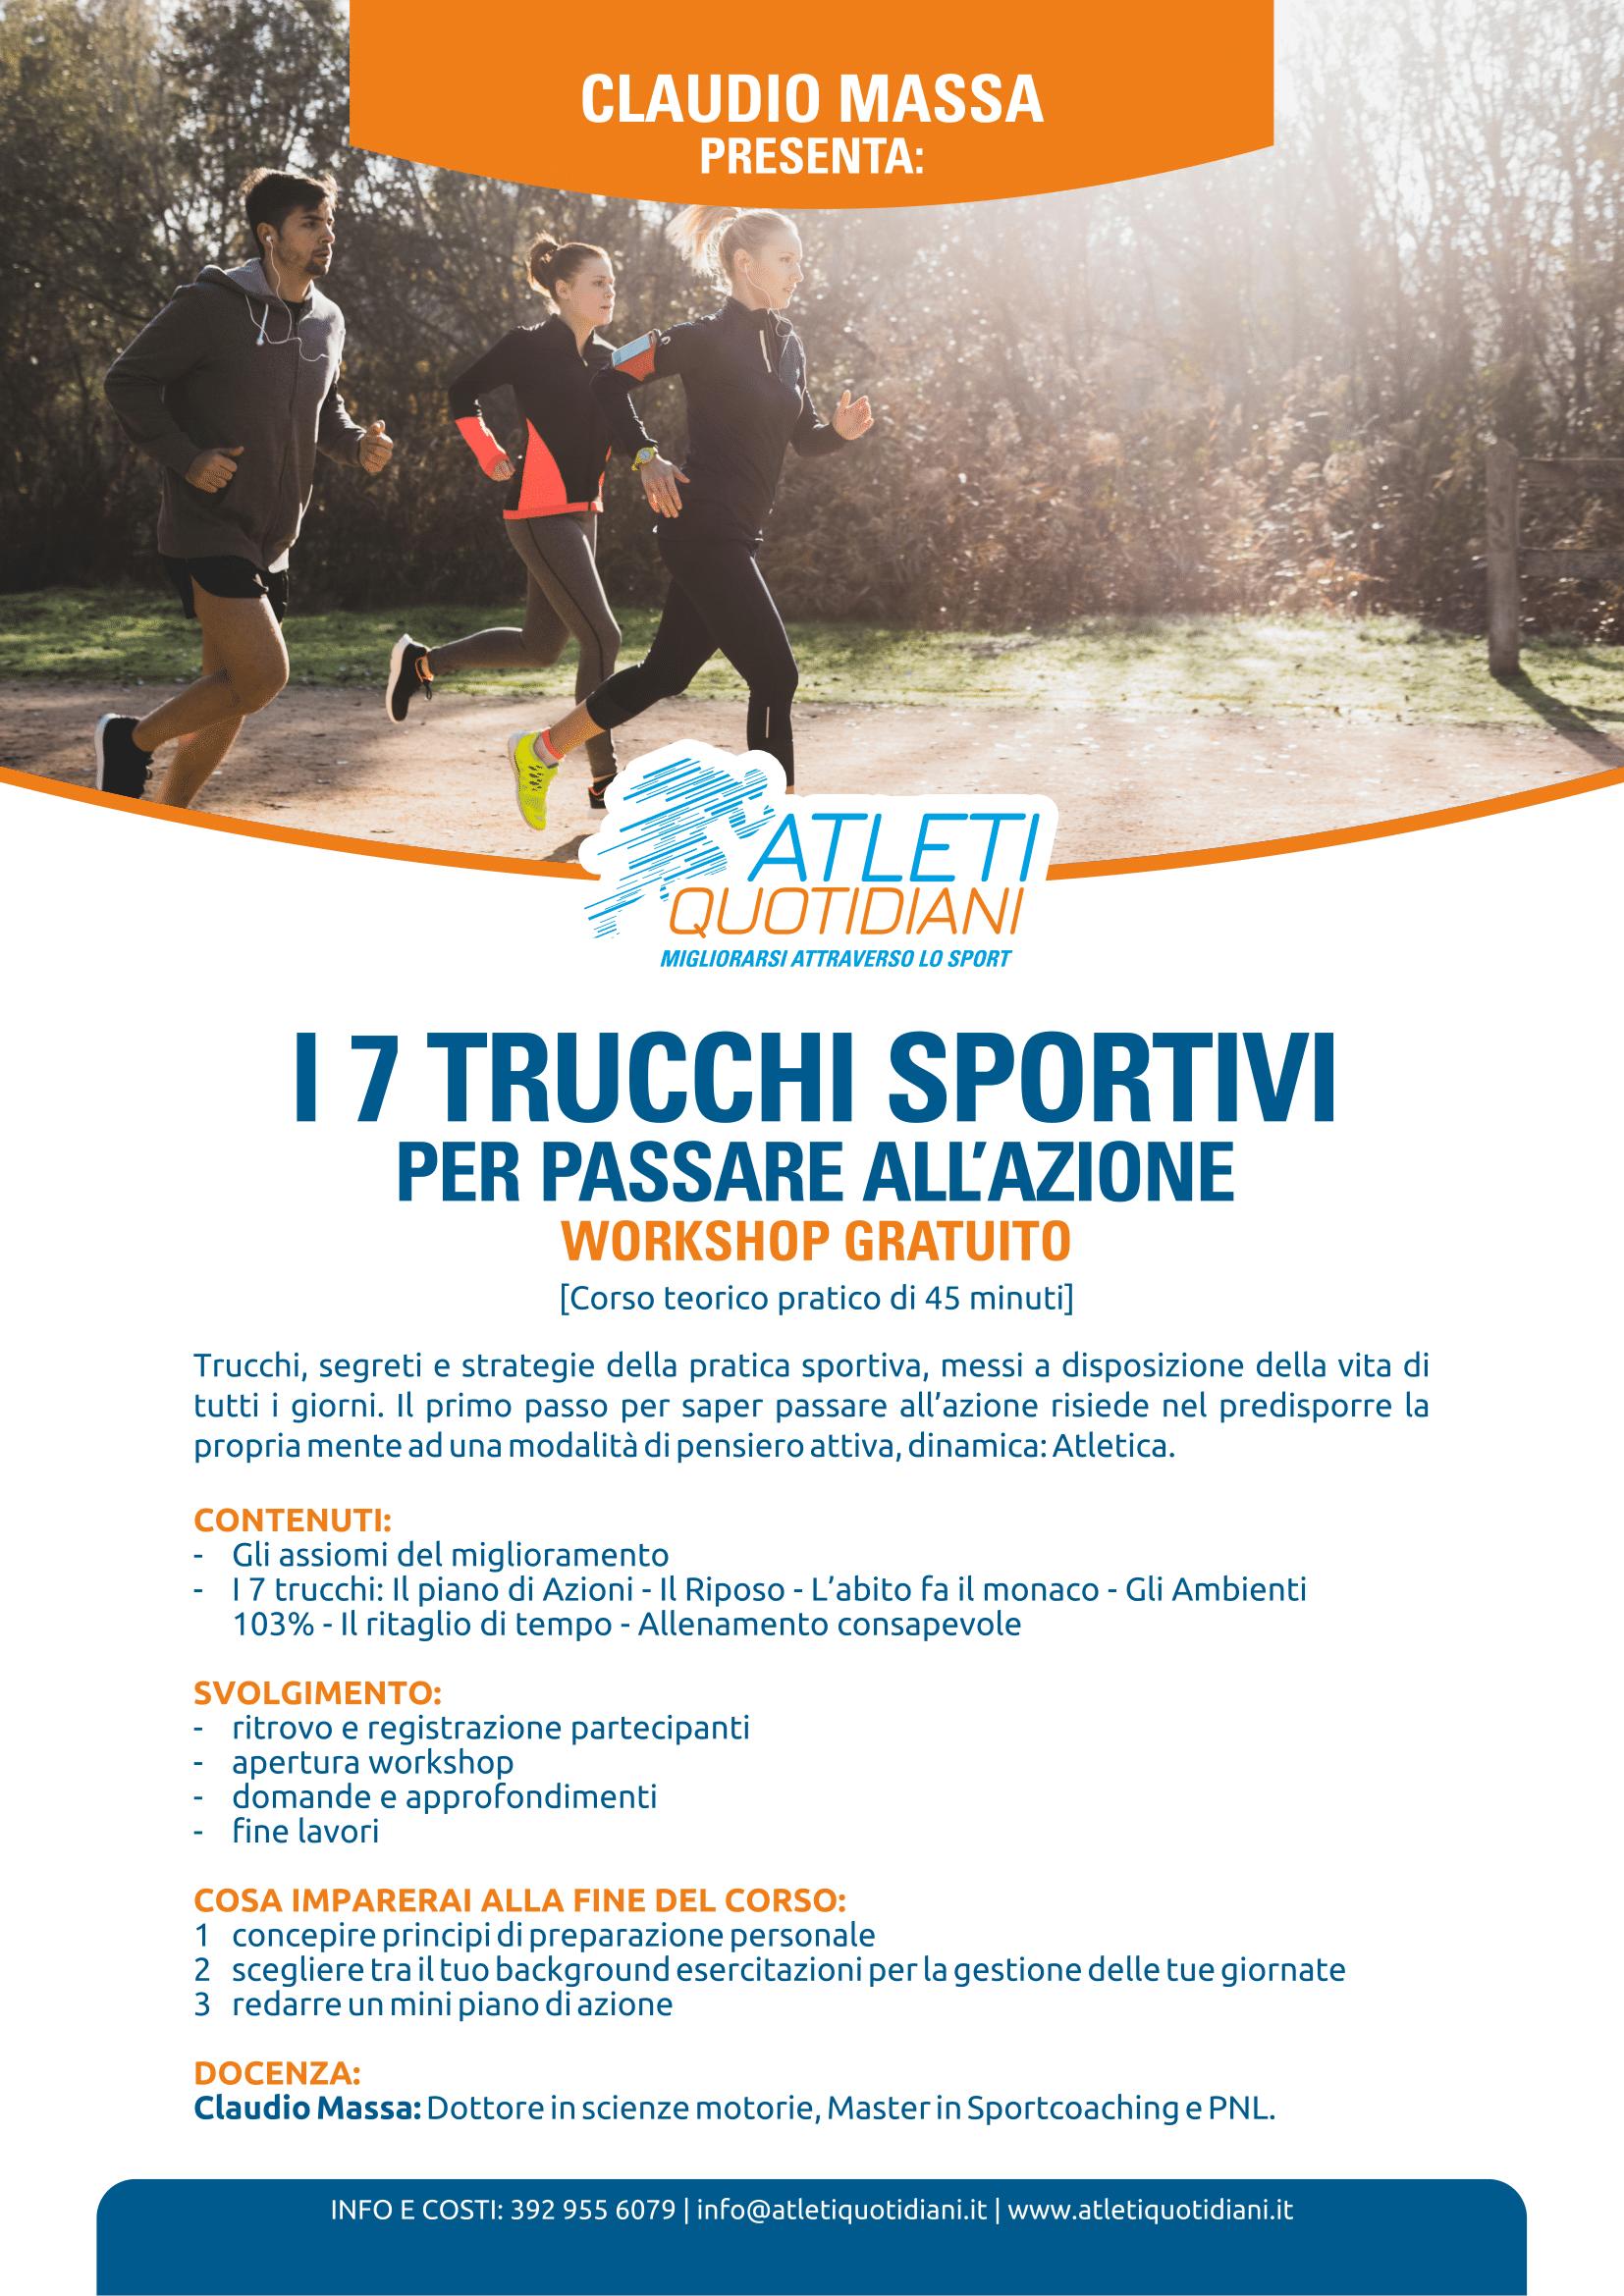 Atleti Quotidiani 7 trucchi